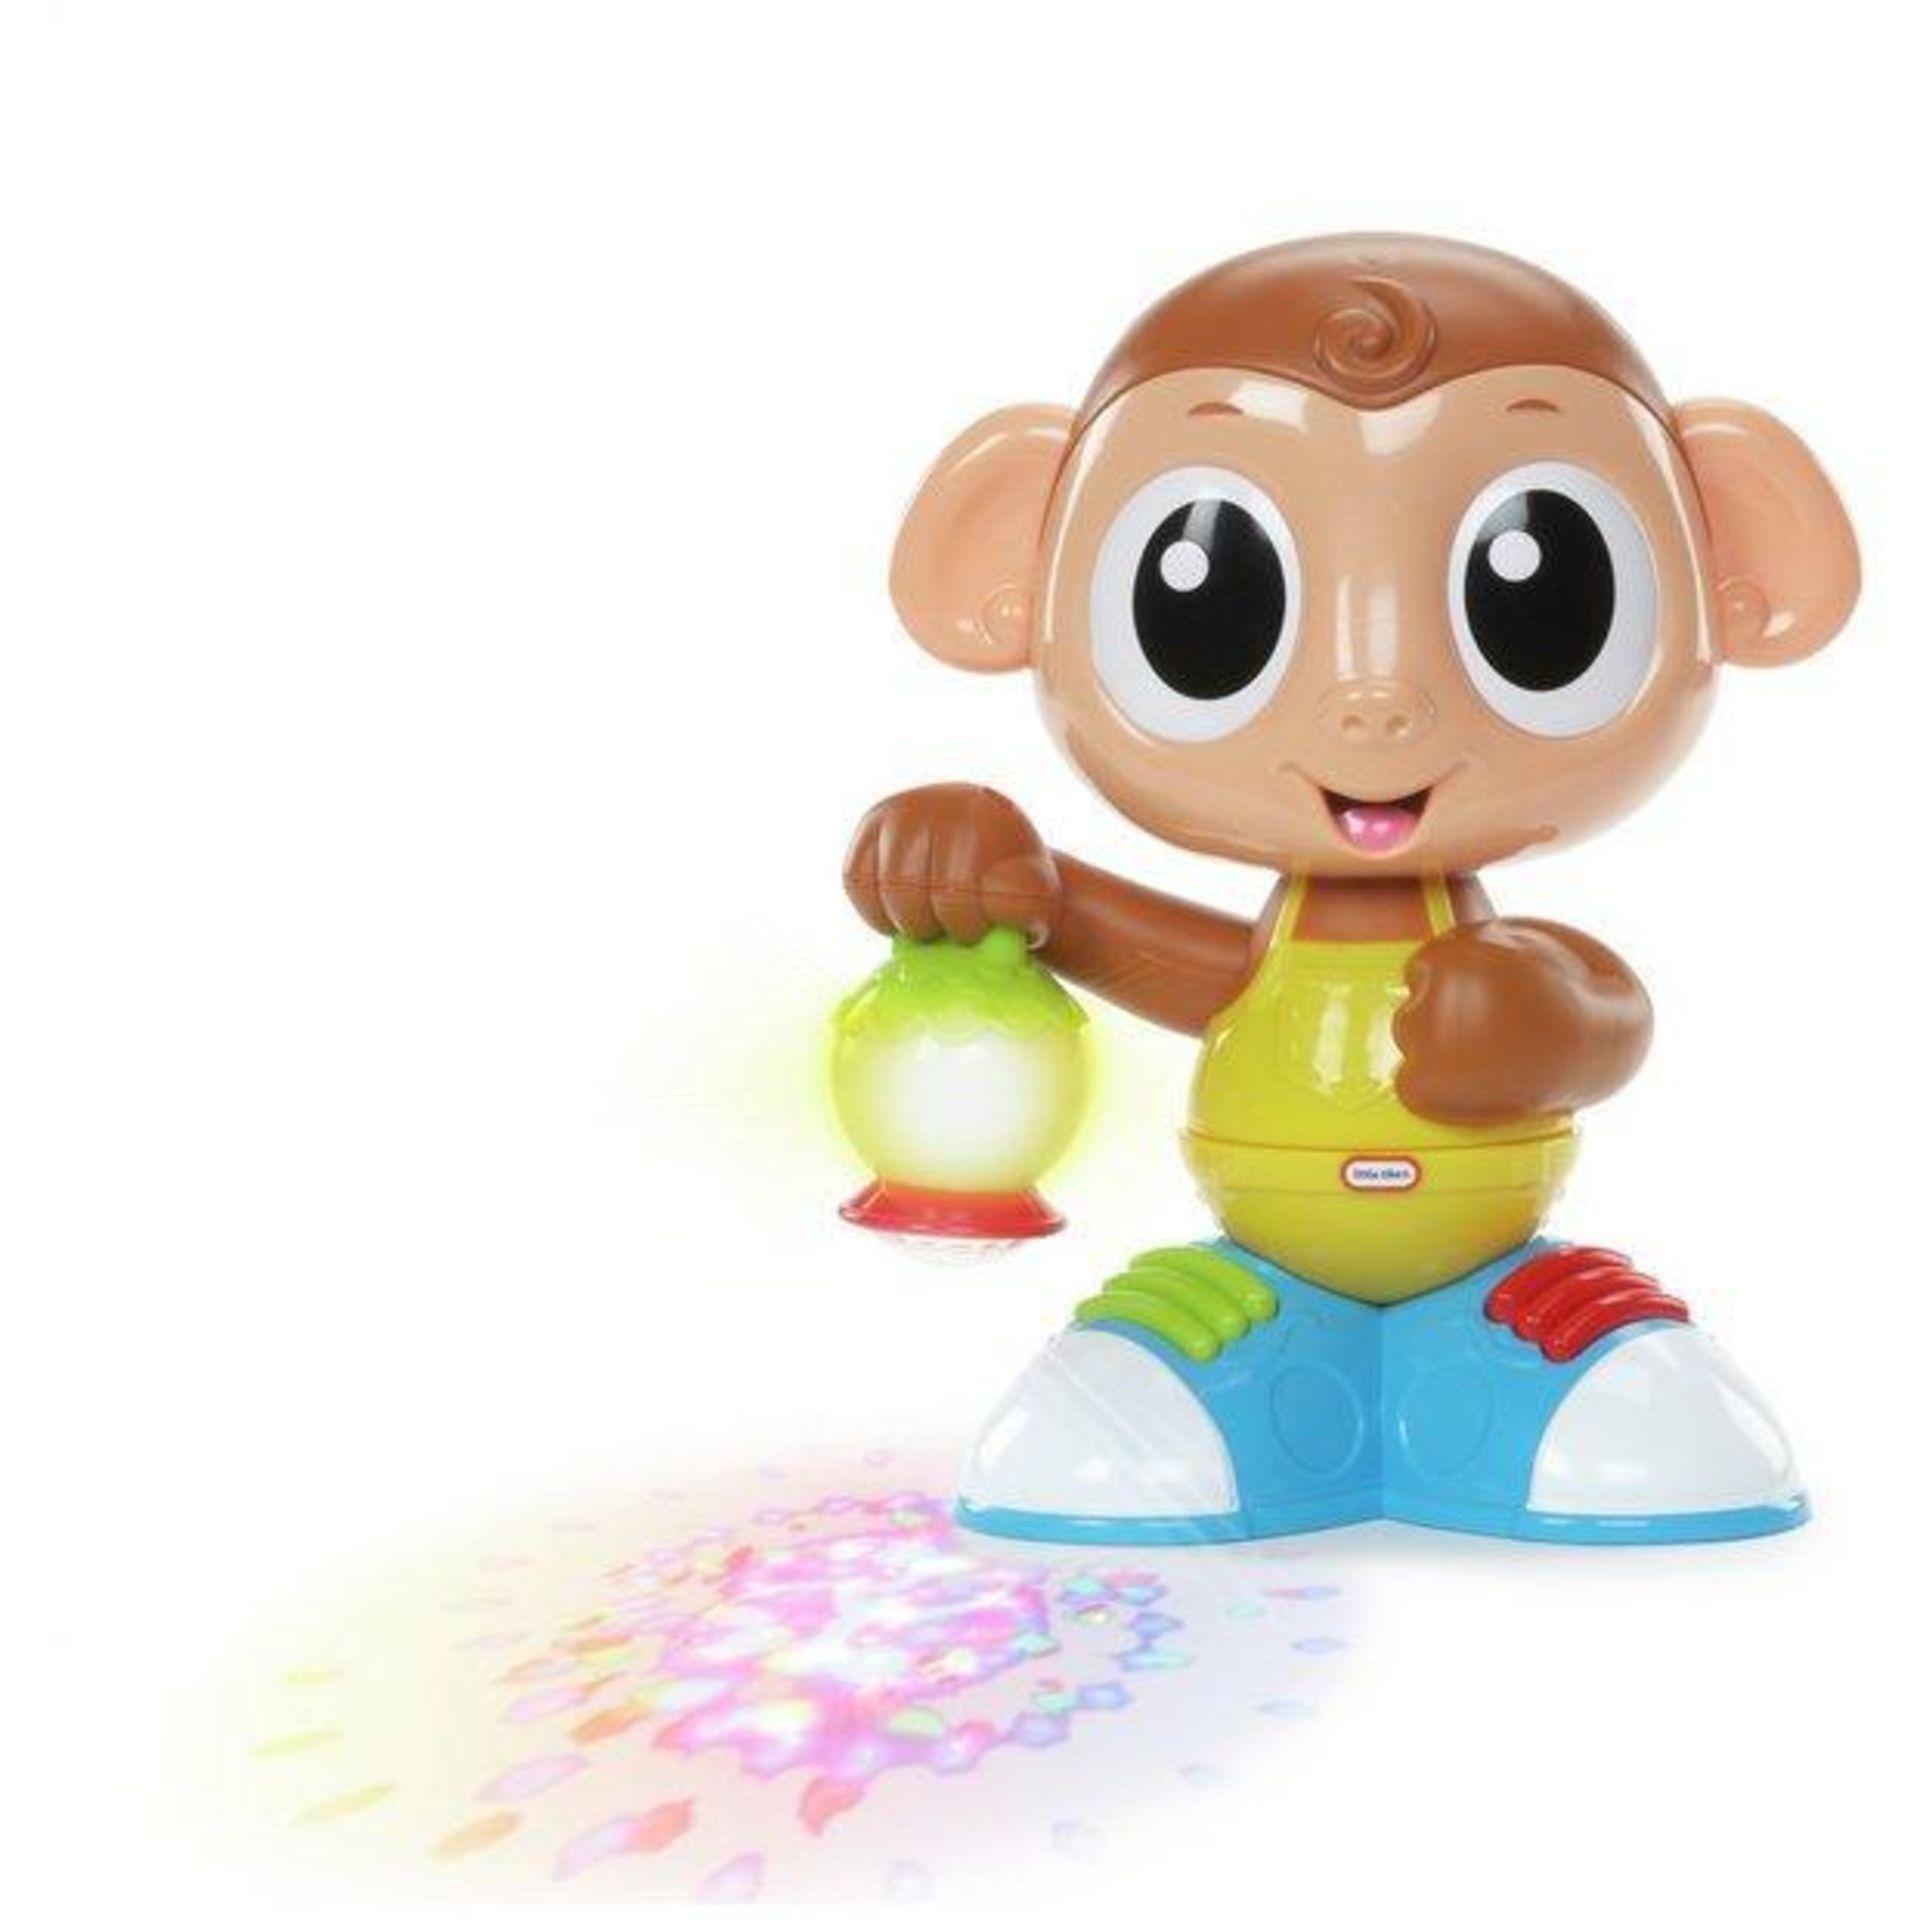 Little Tikes Moving Lights Monkey - £12.00 RRP